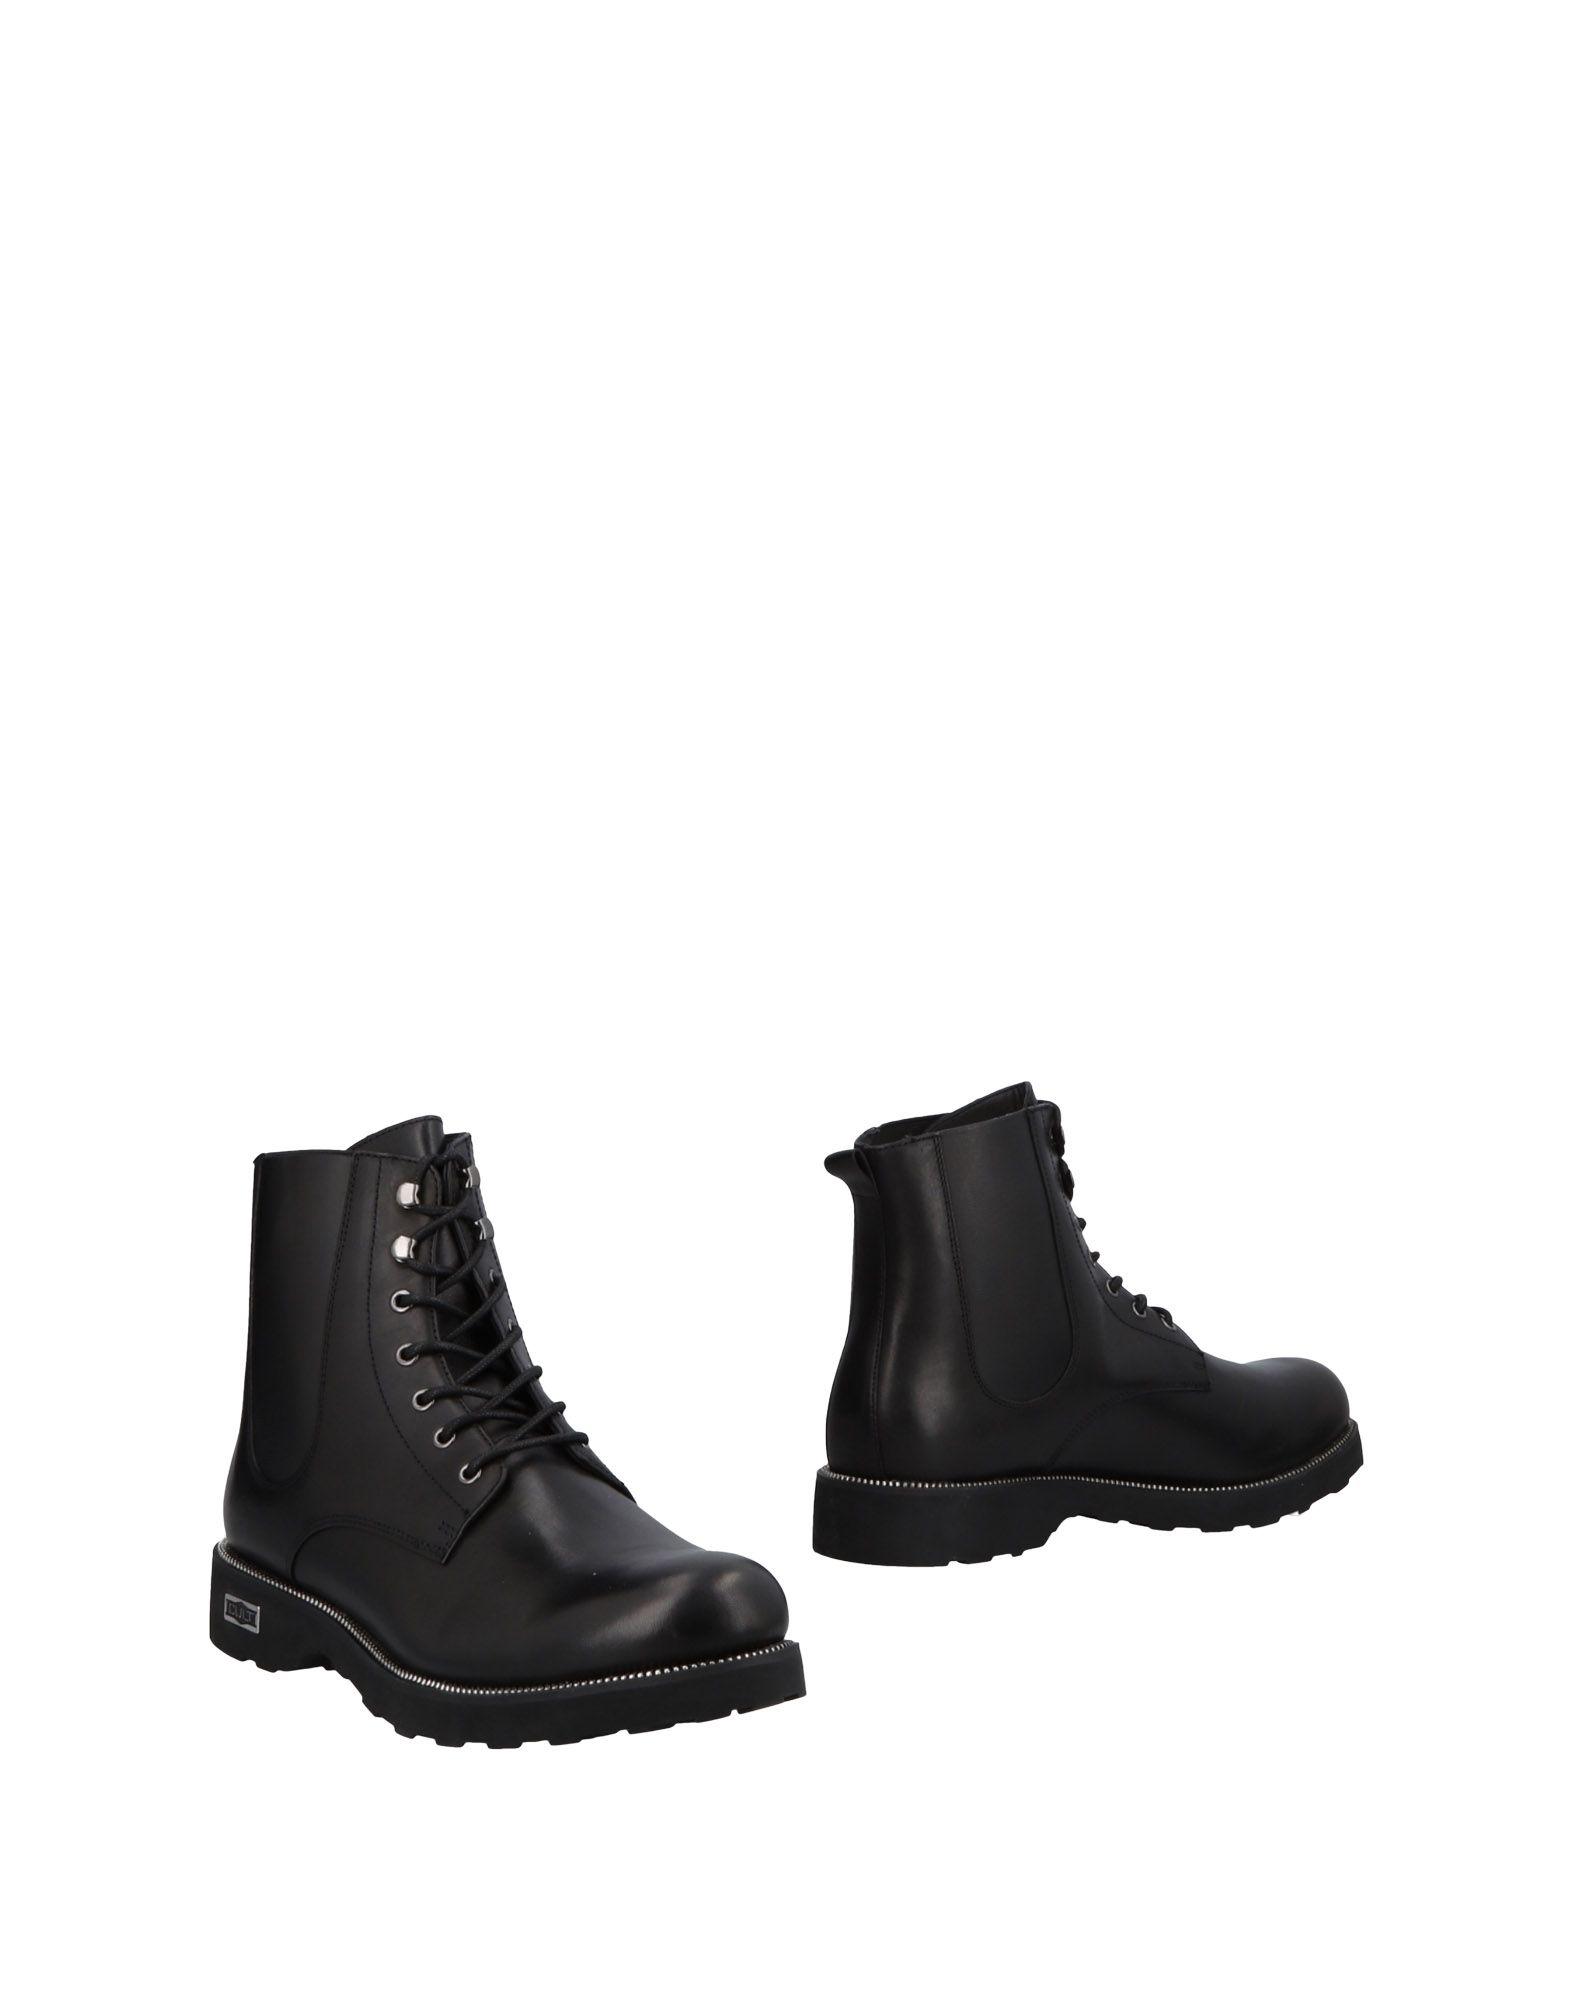 Rabatt echte Schuhe Cult Stiefelette Herren  11474777DV